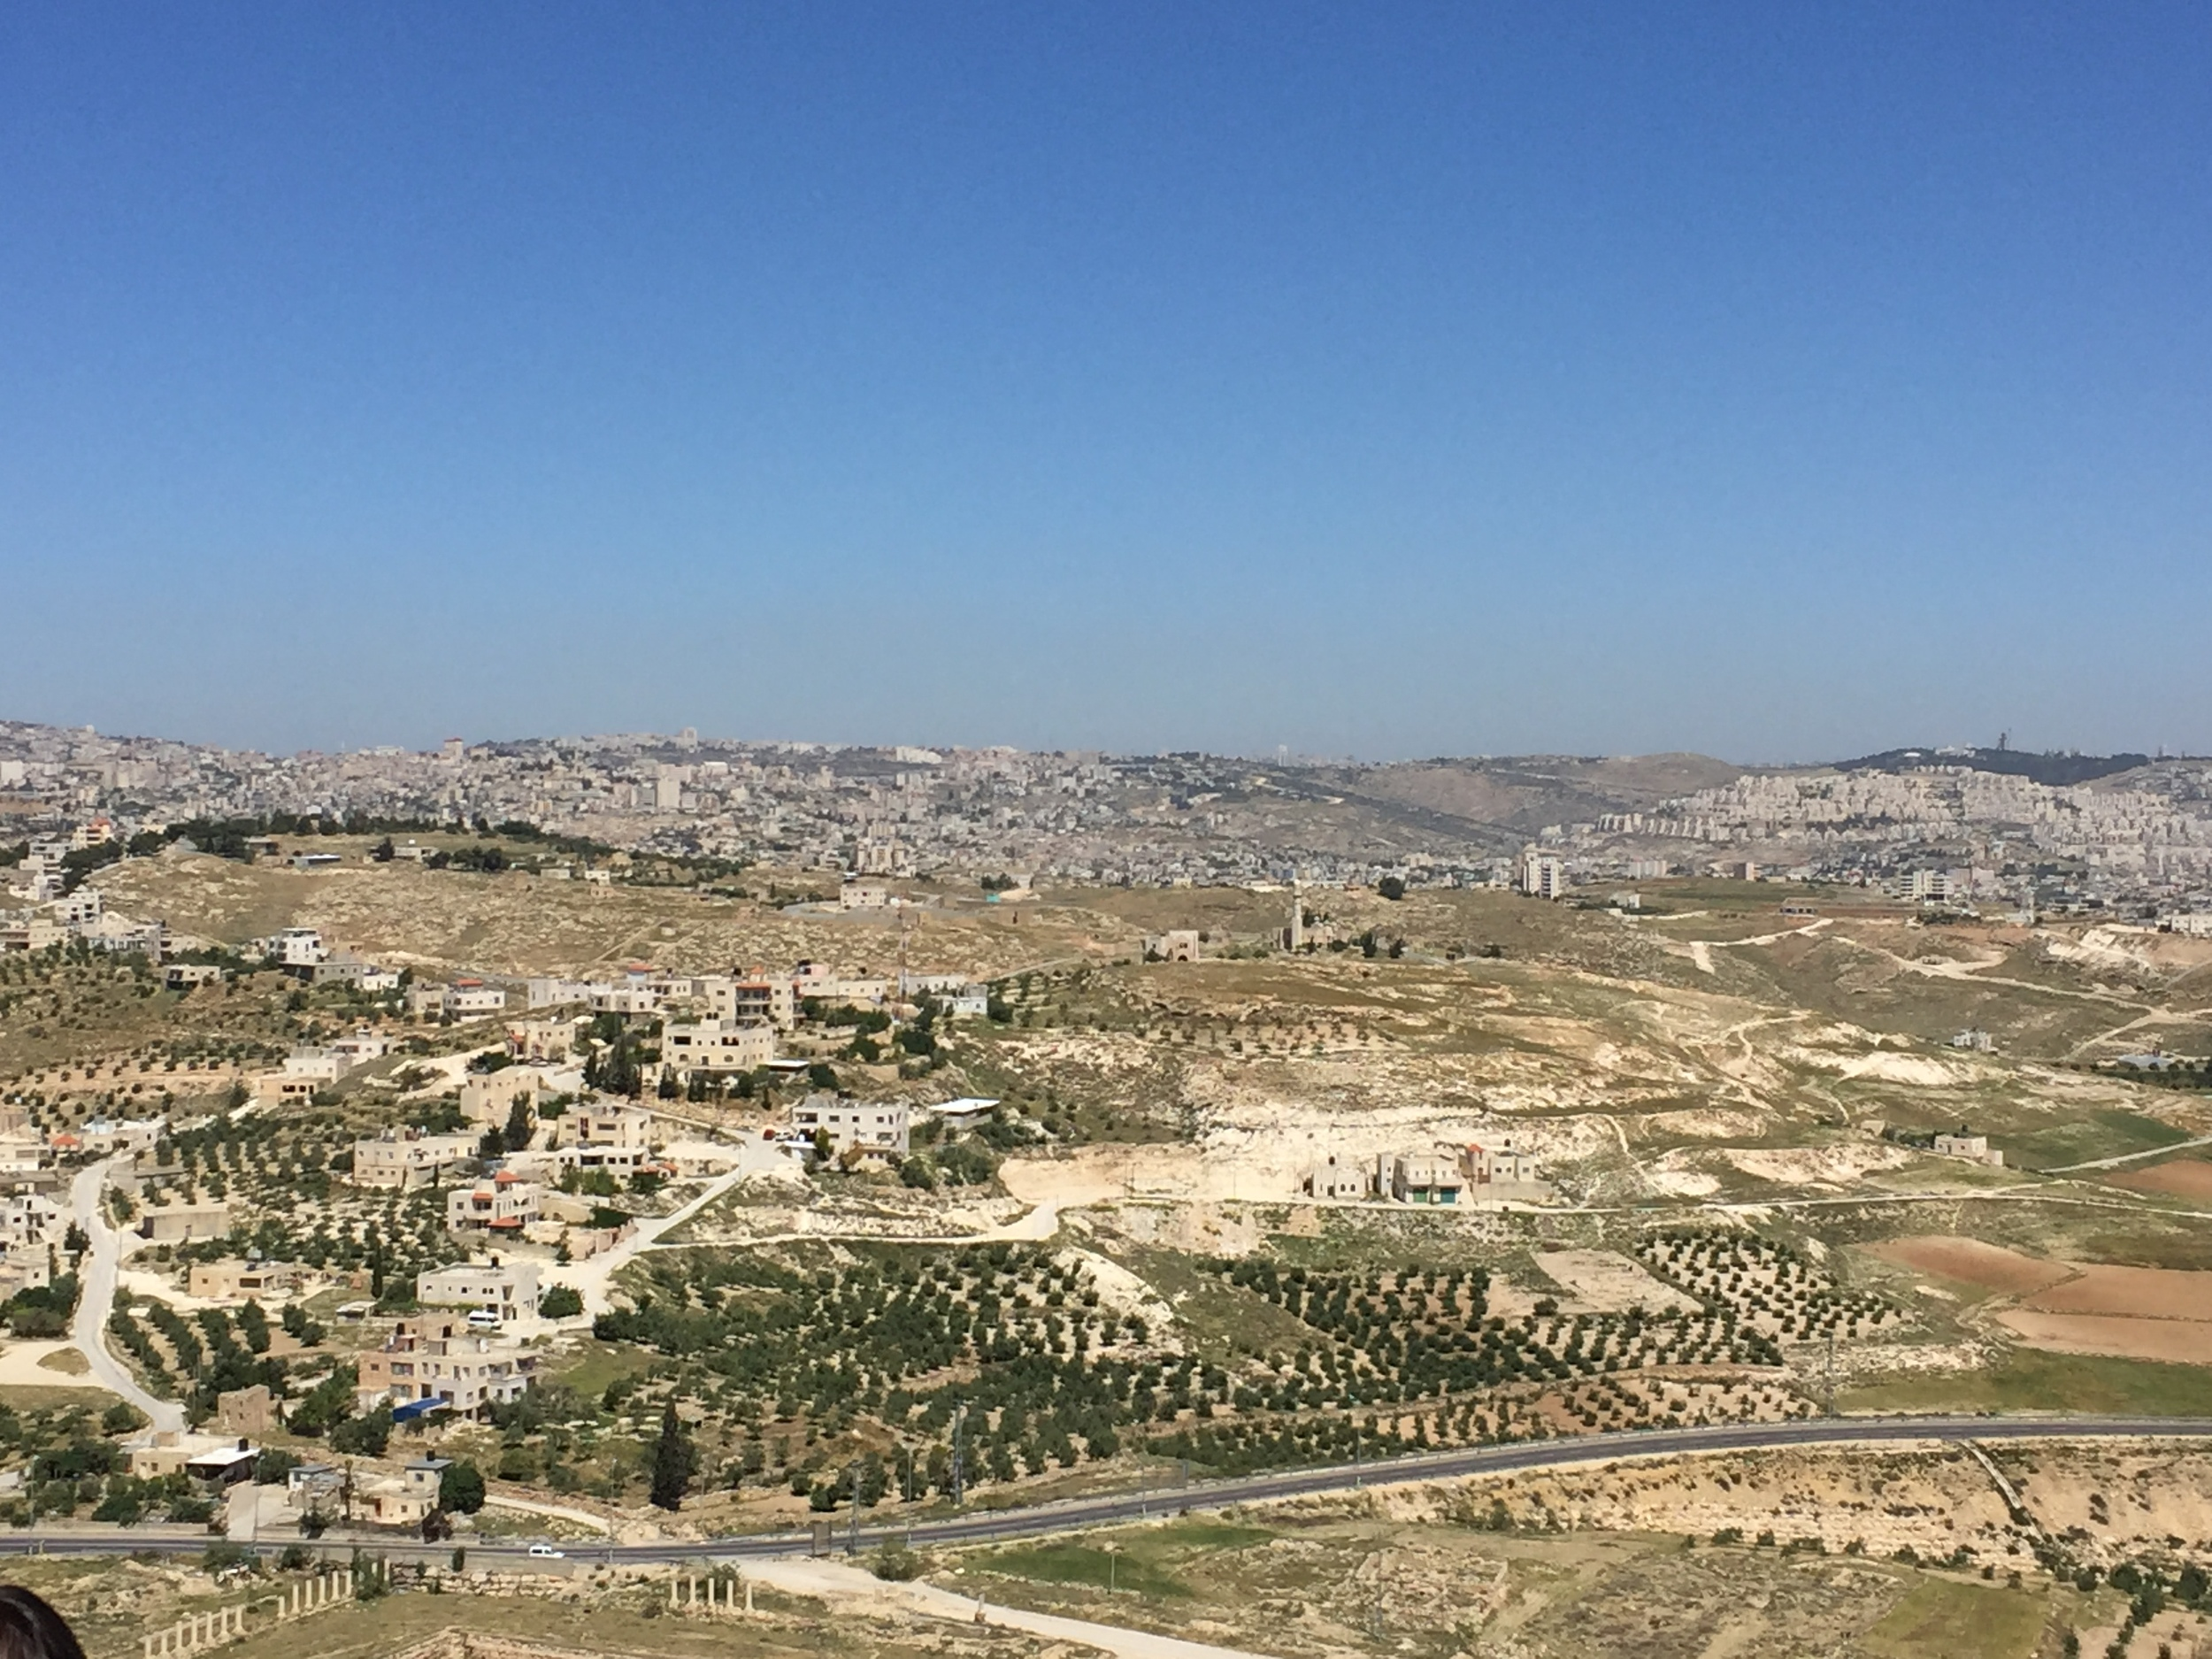 The town of Bethlehem